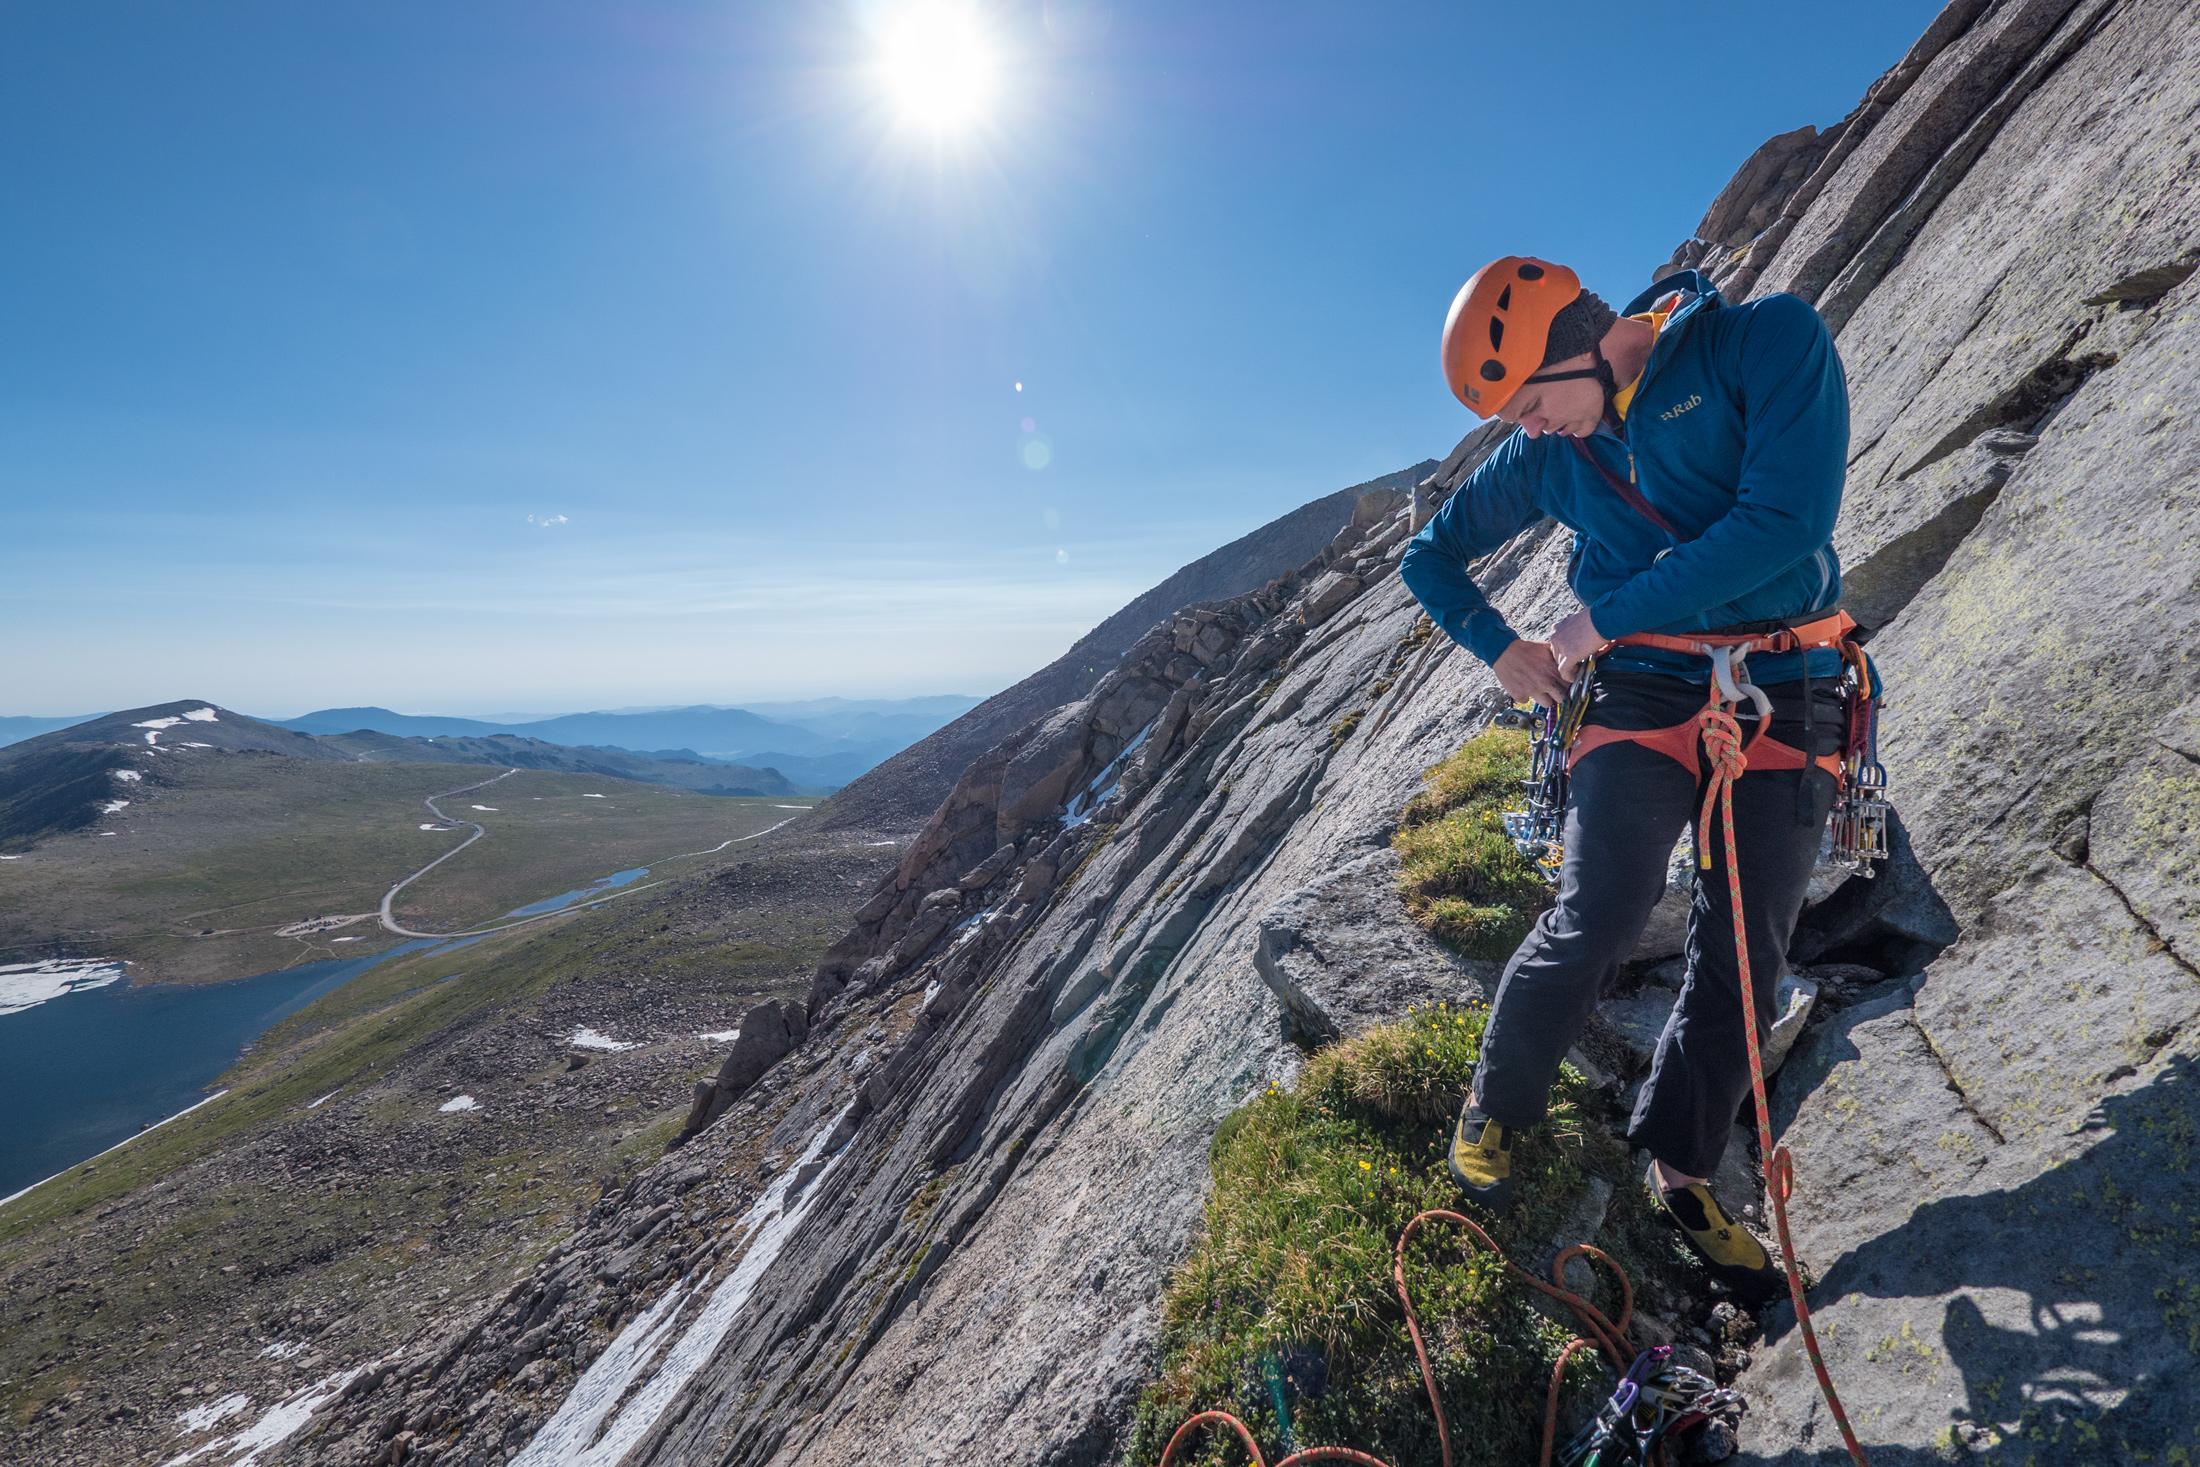 colorado-climbing-2017-1030456-web.jpg